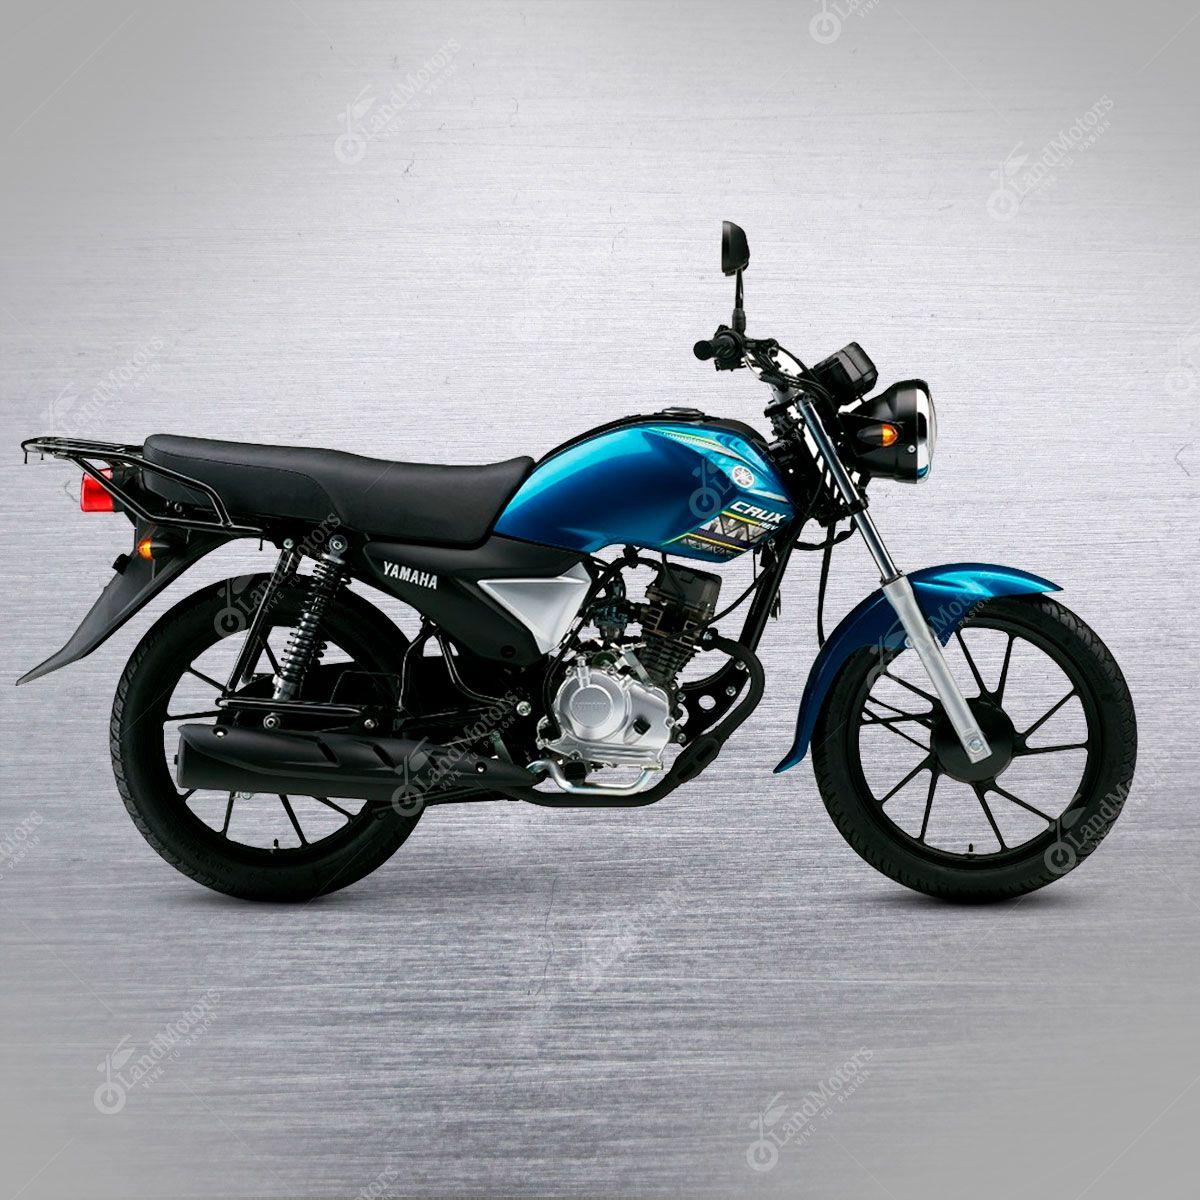 yamaha yd 110 crux rev landmotors vive tu pasion regarding the 1200x1200